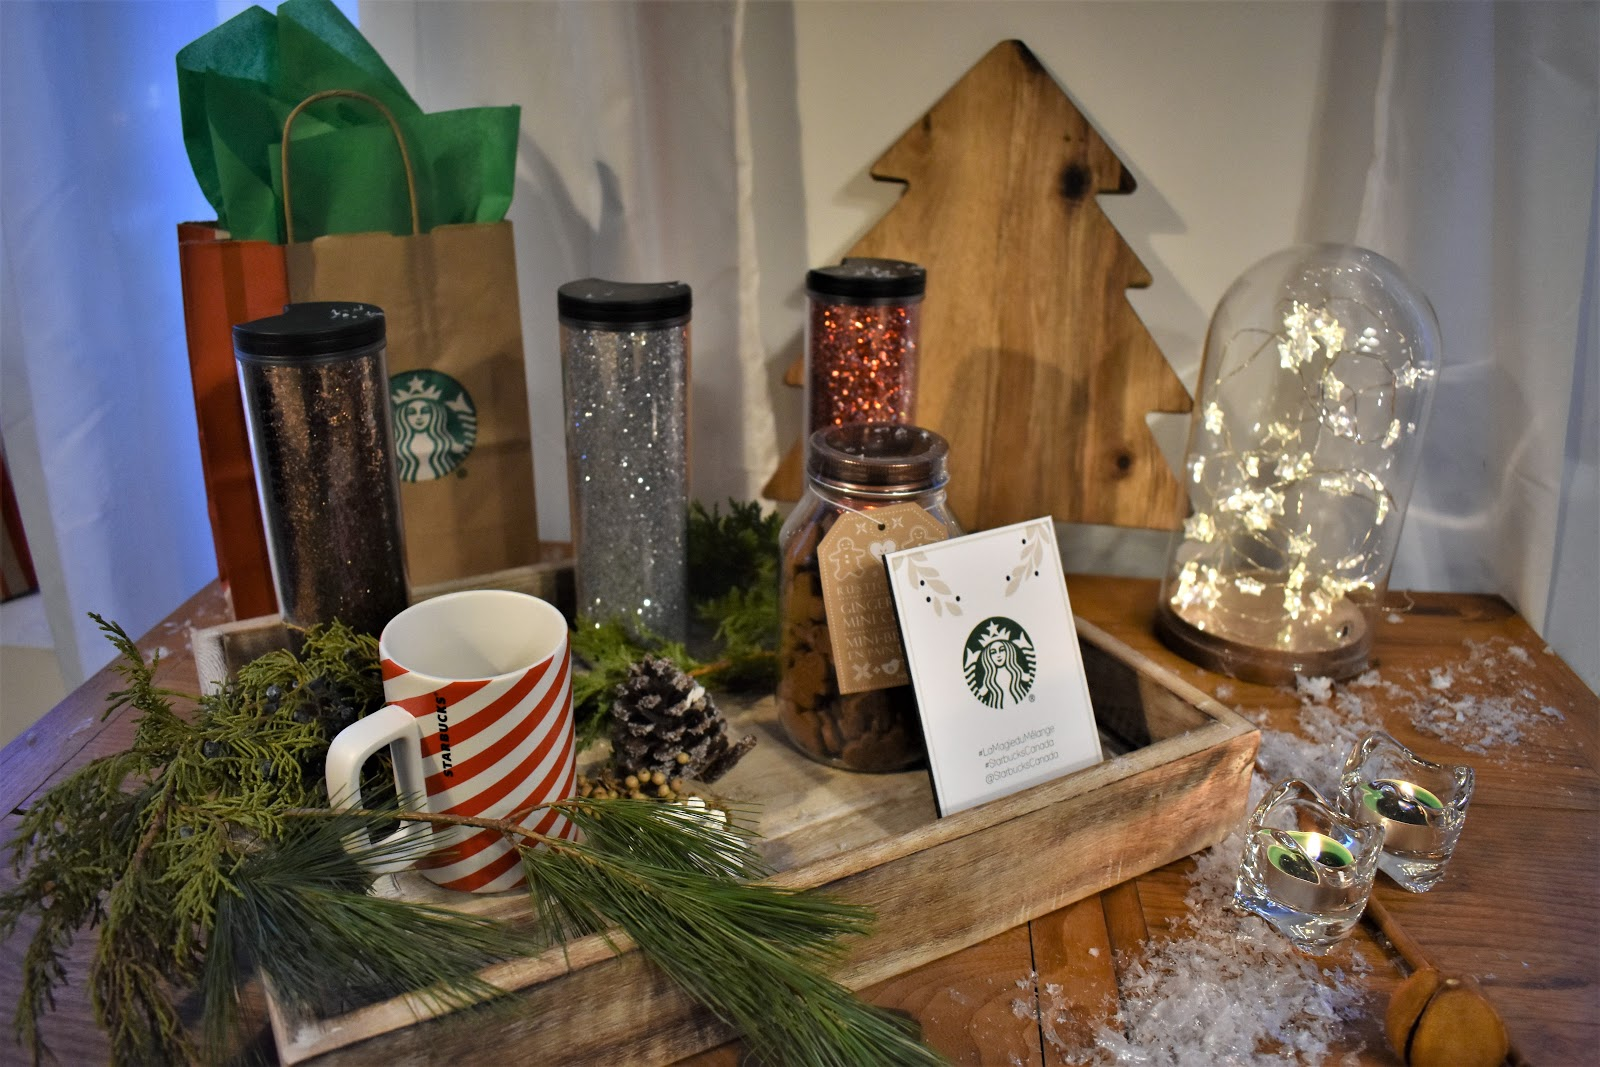 Montréalité Notre Starbucks Noël Noël Notre Starbucks Noël Montréalité wXOkZuPiT